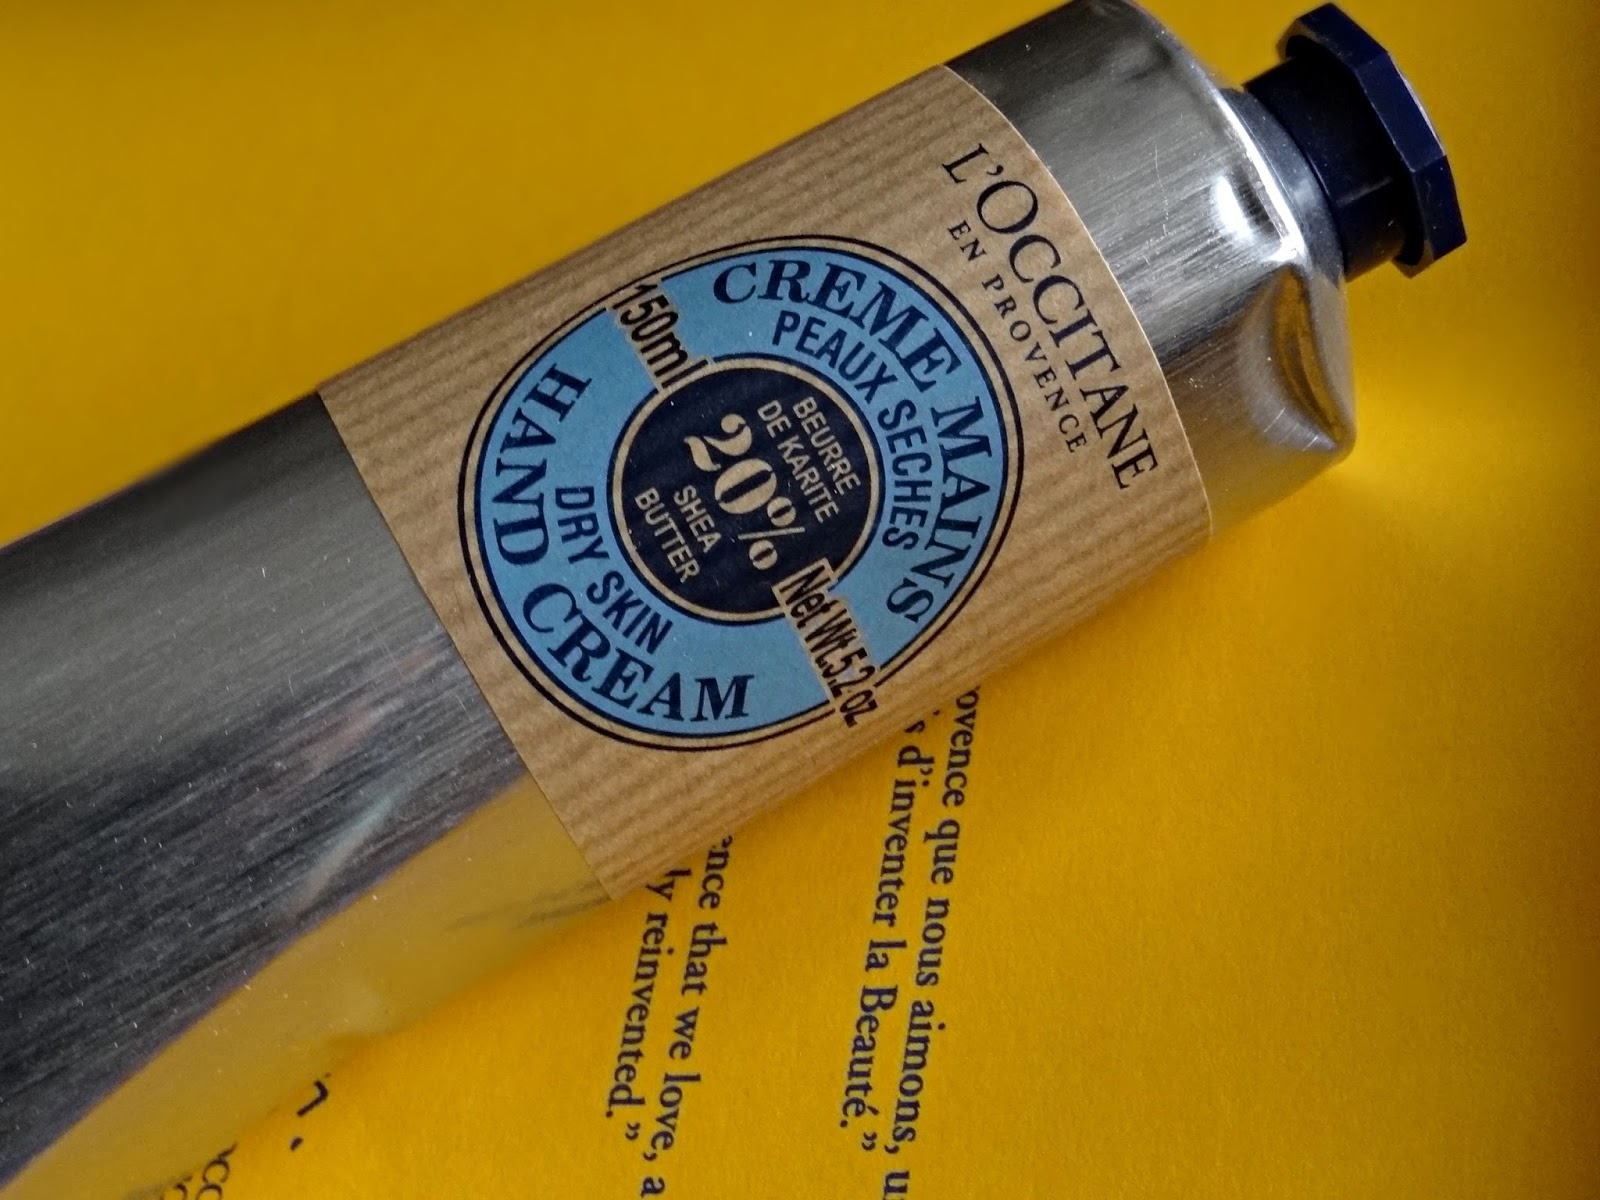 L'Occitane The Secret To Beautiful hands Shea Butter Hand Cream